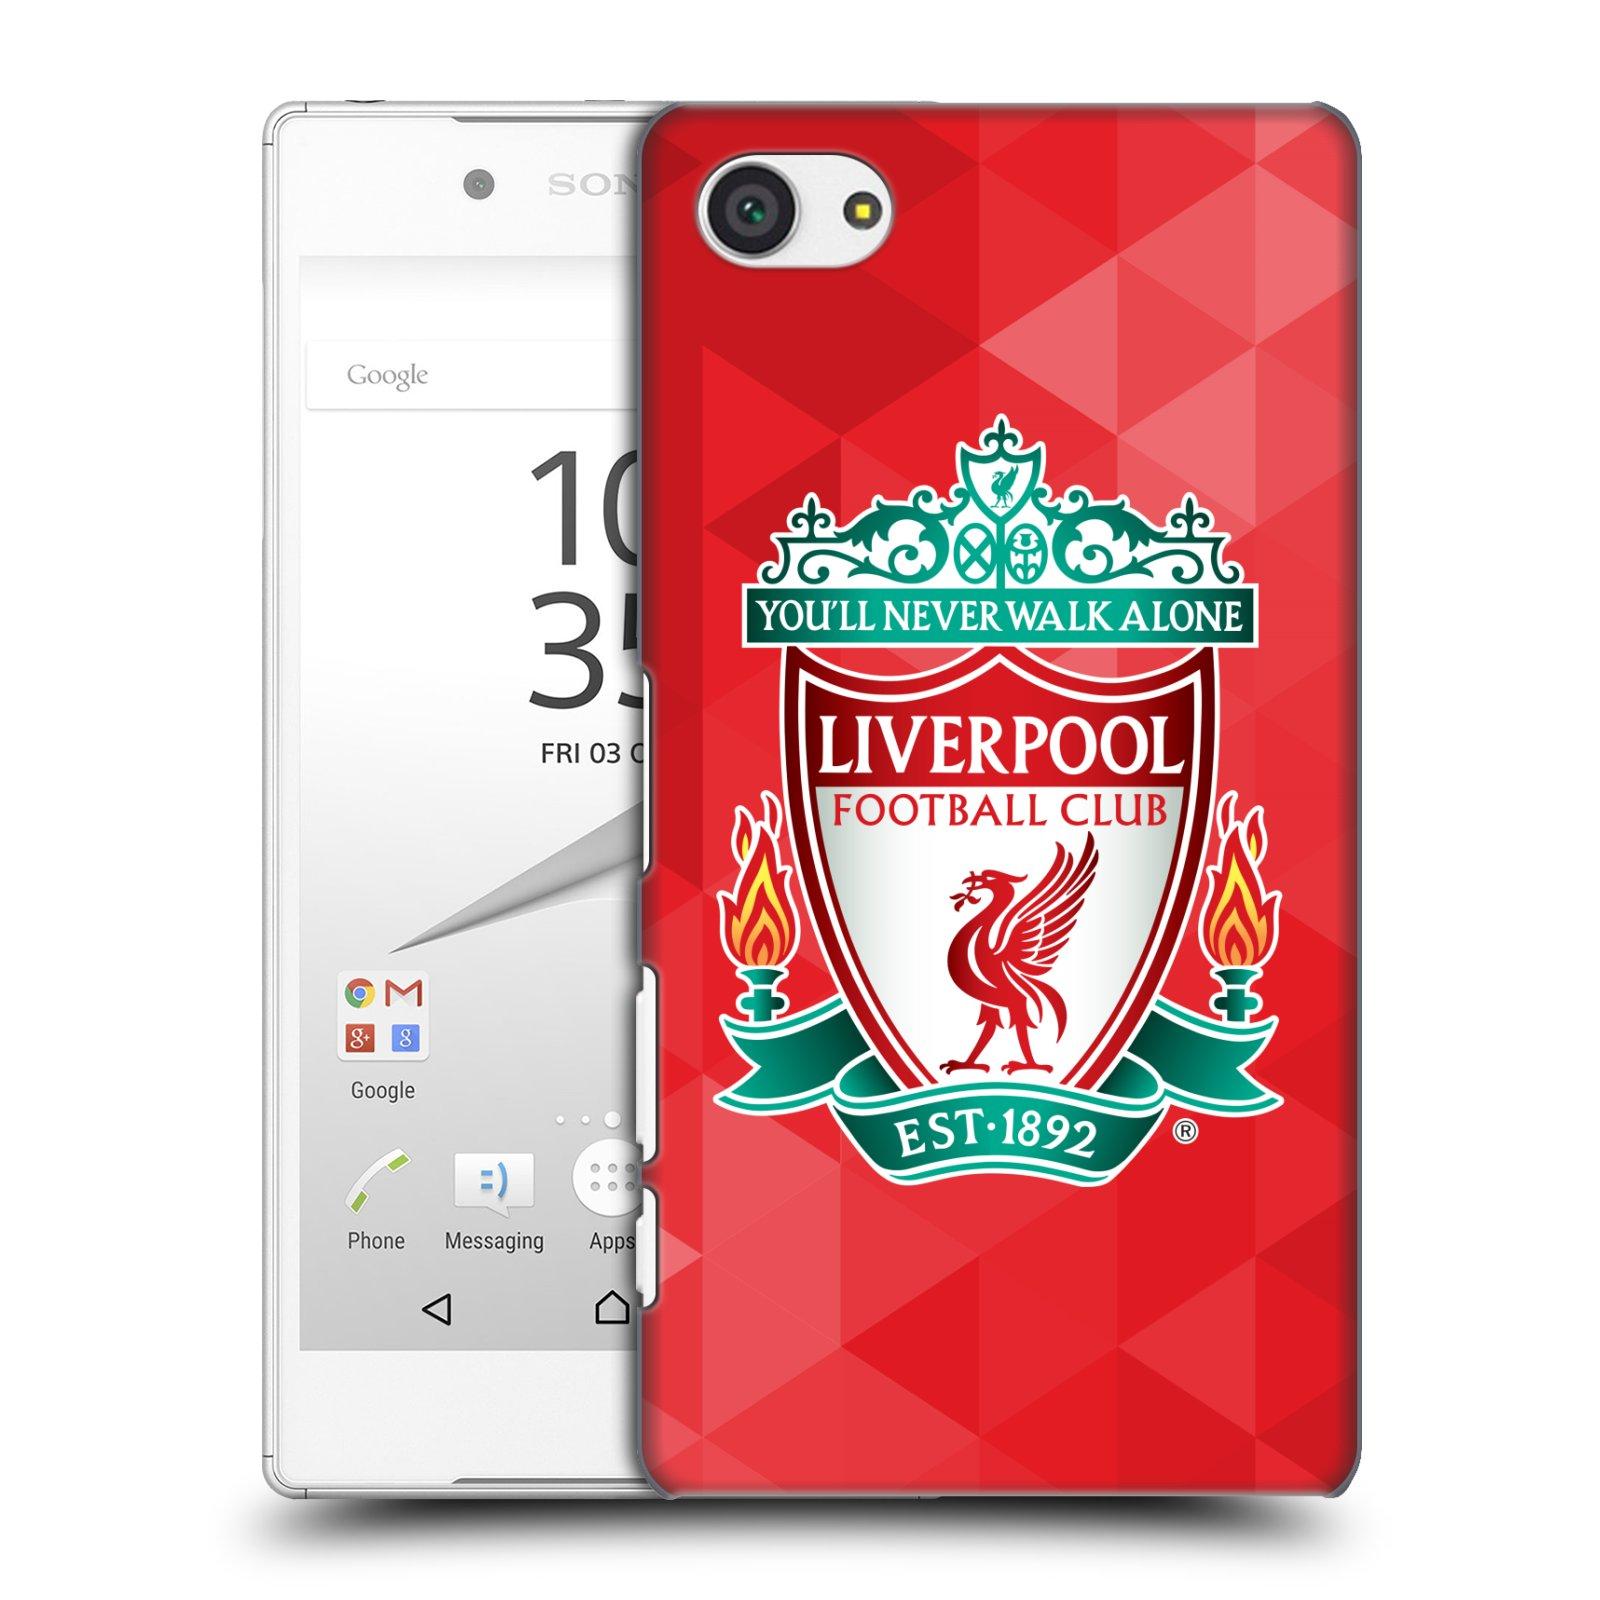 Plastové pouzdro na mobil Sony Xperia Z5 Compact HEAD CASE ZNAK LIVERPOOL FC OFFICIAL GEOMETRIC RED